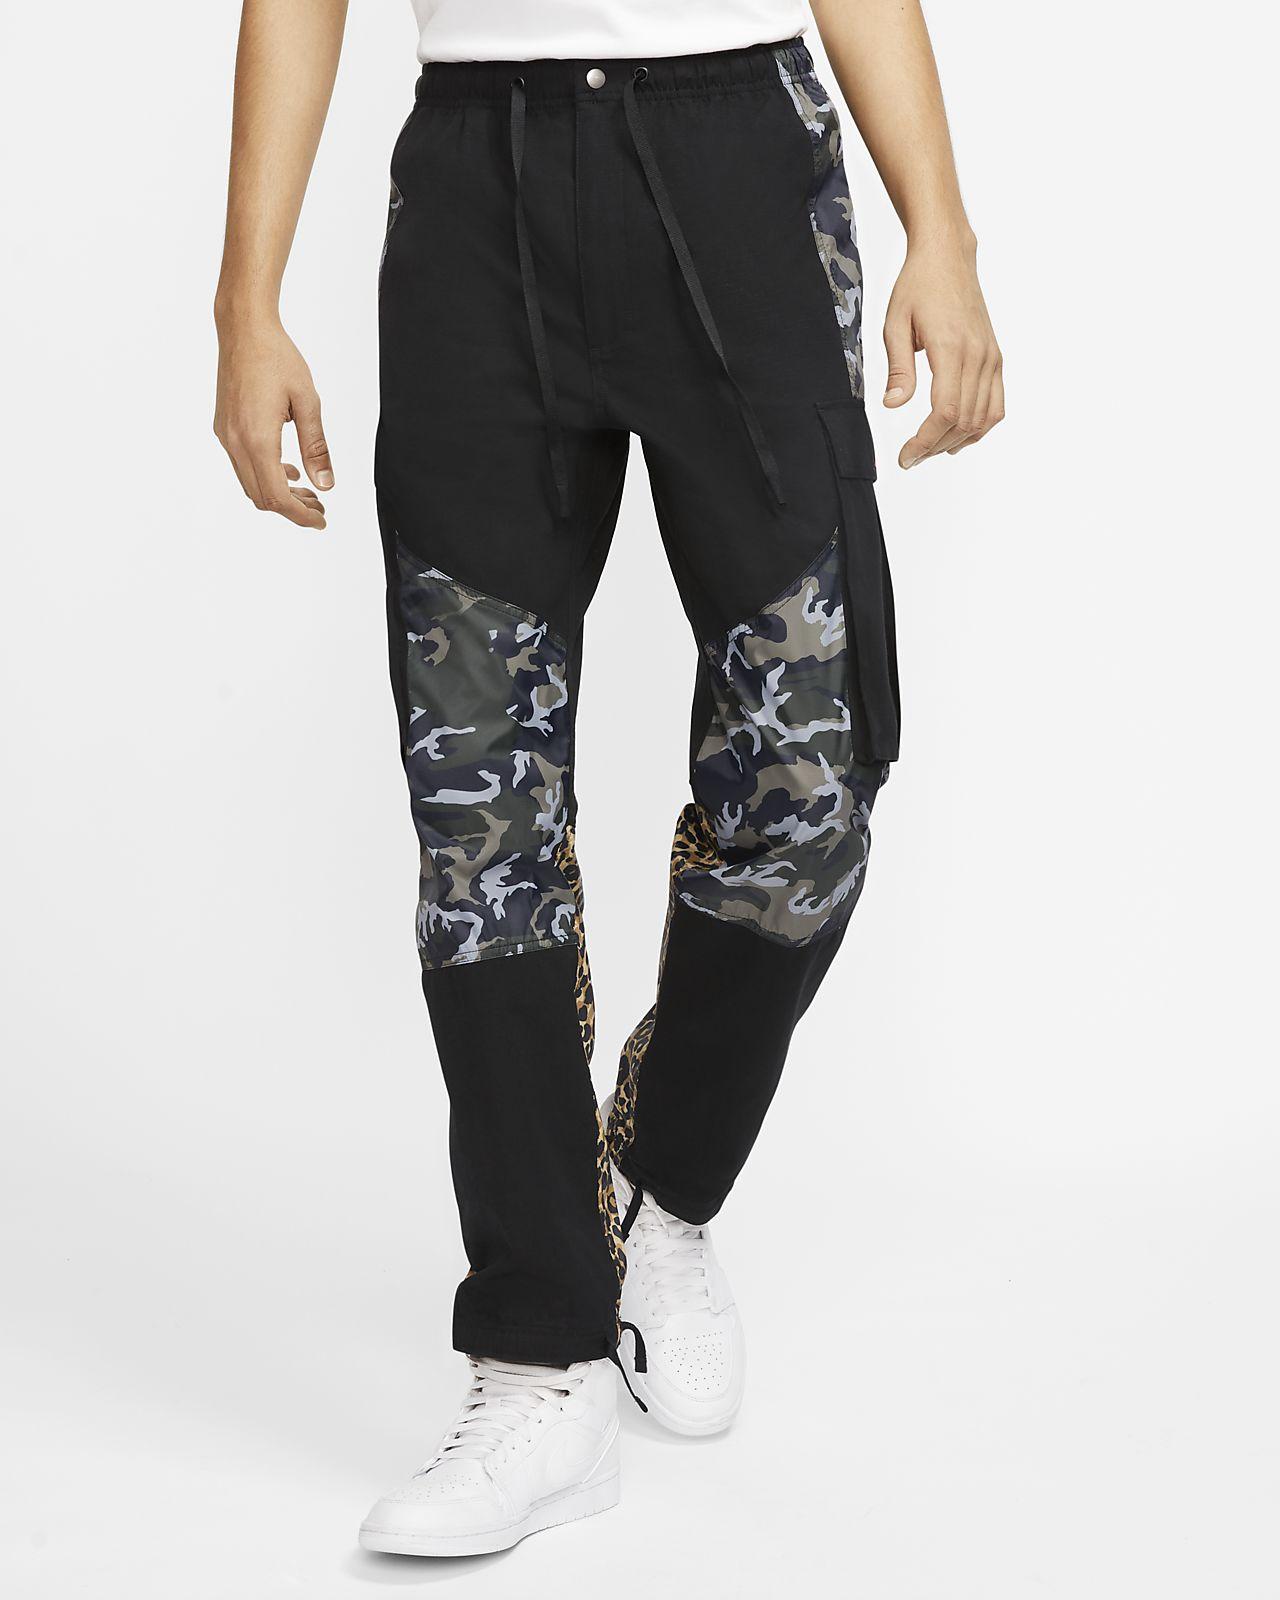 Pantalon Jordan Animal Instinct pour Homme